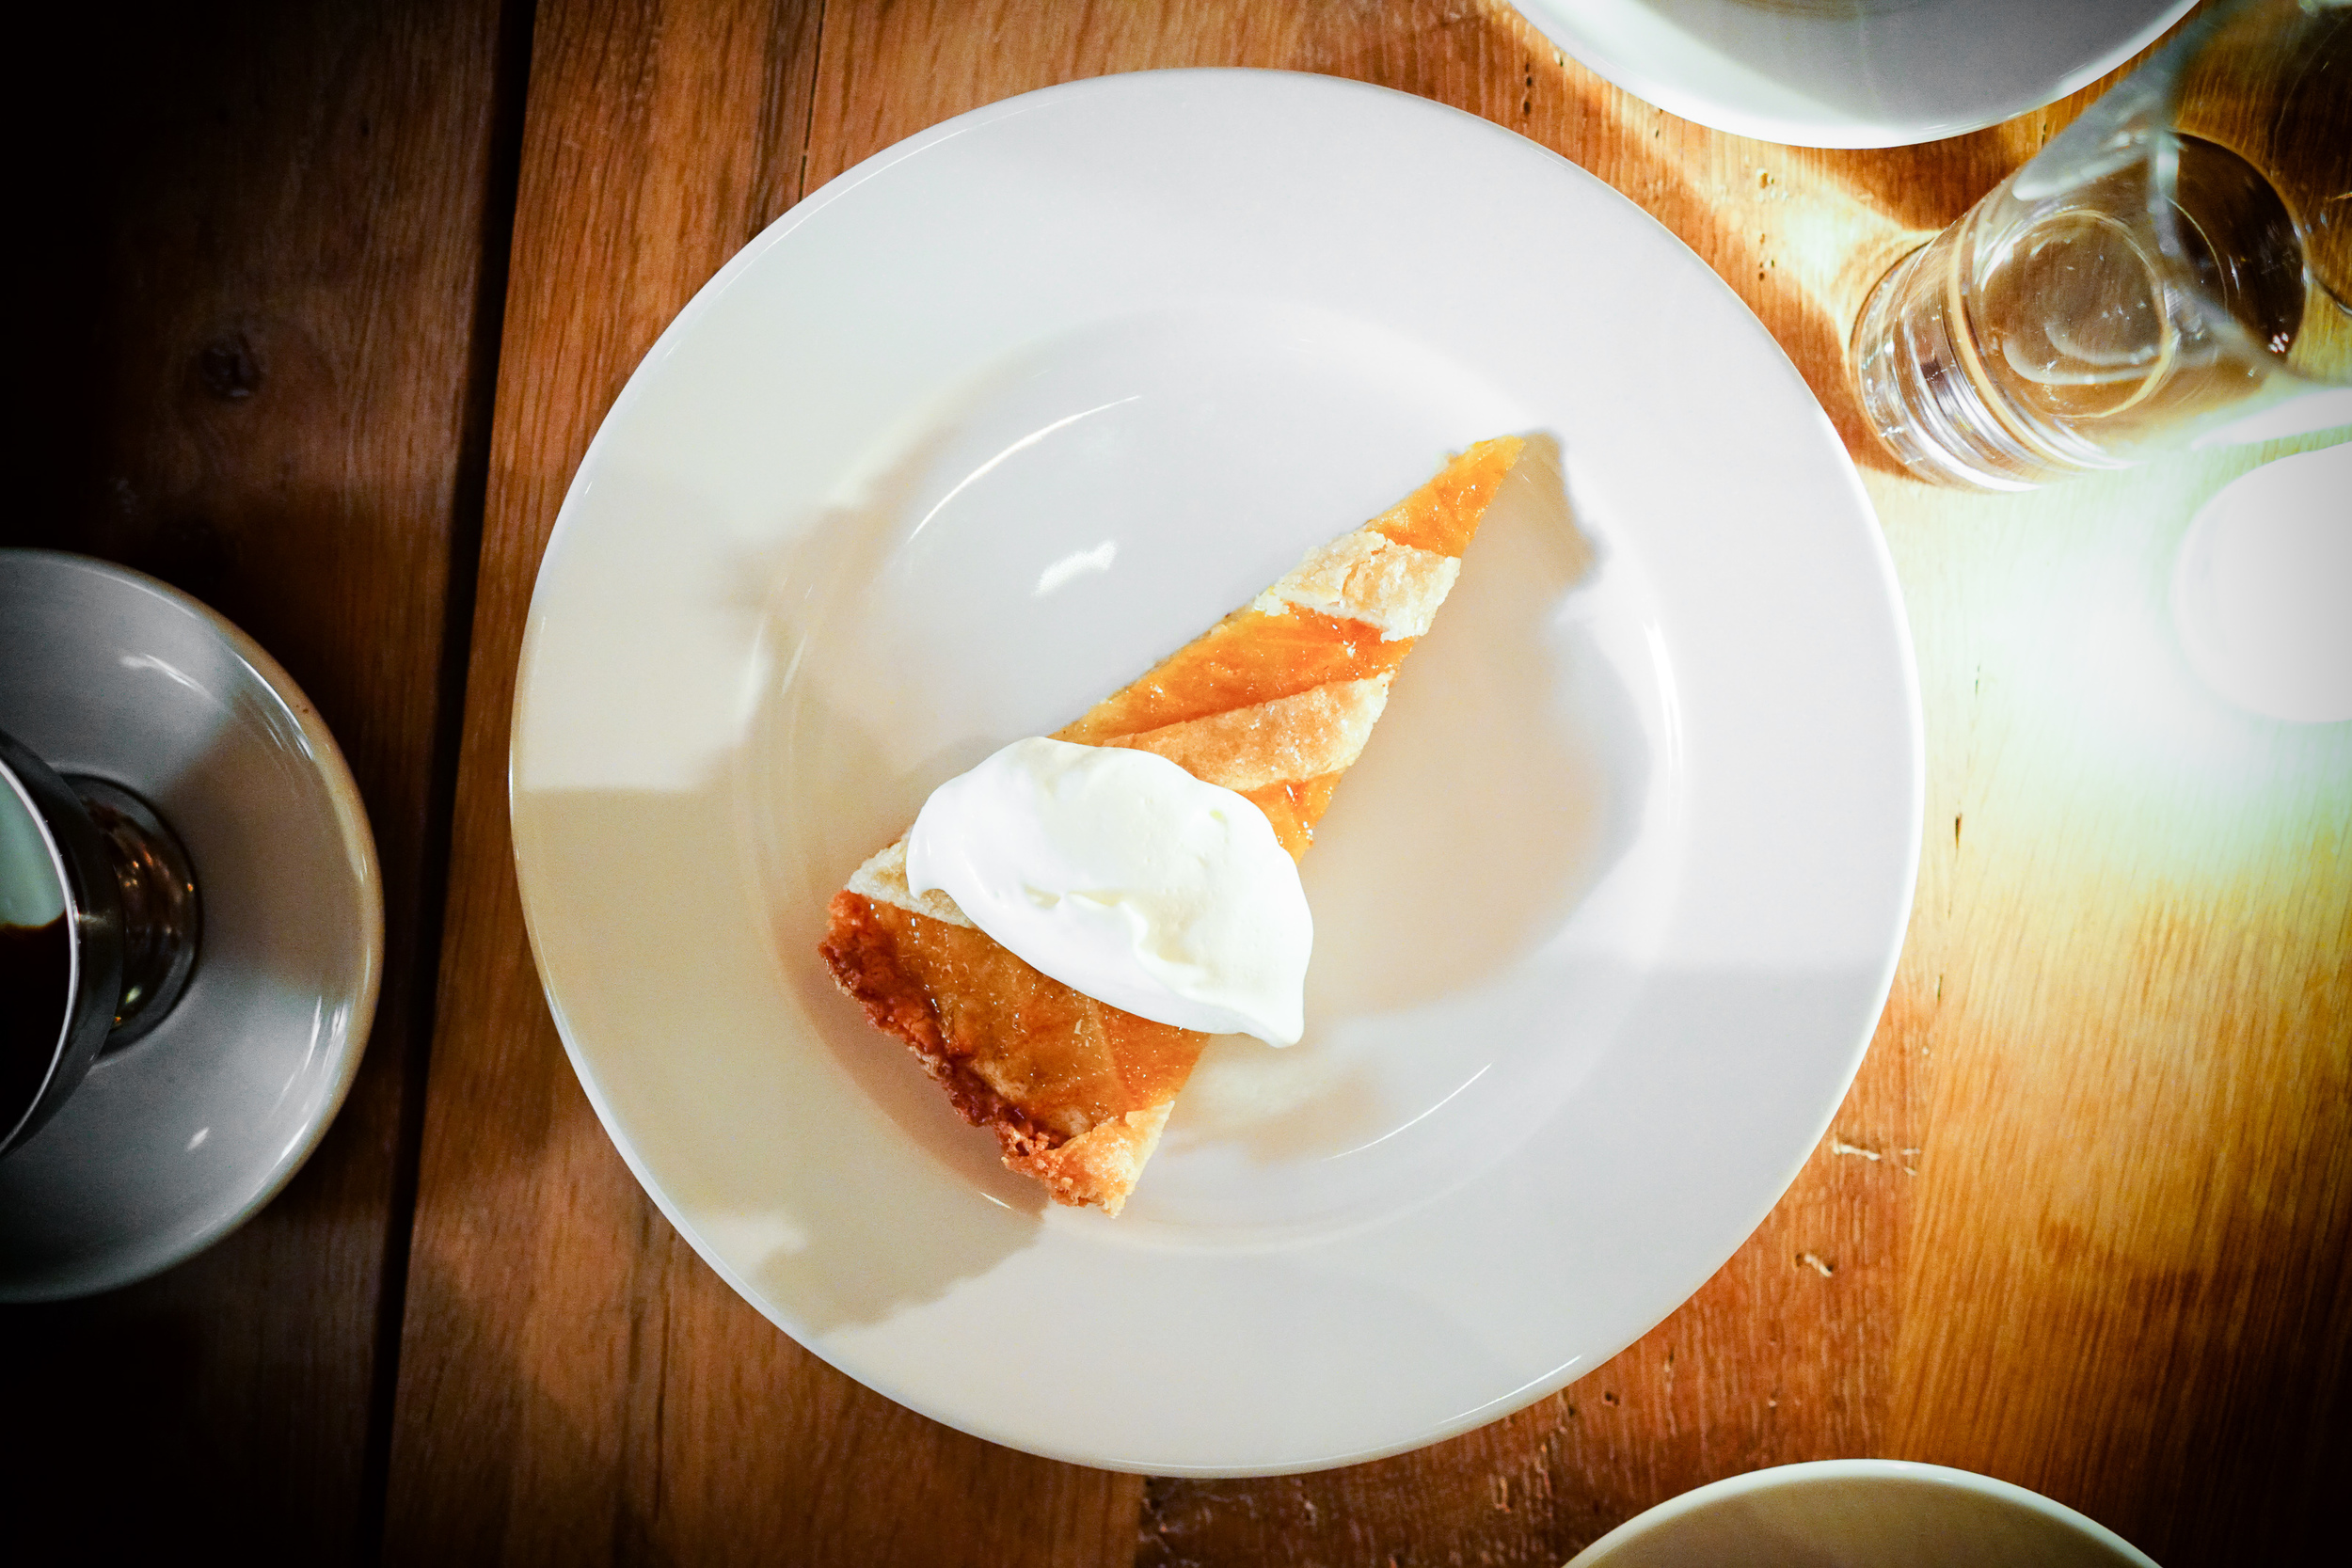 Seasonal crostata ($11)